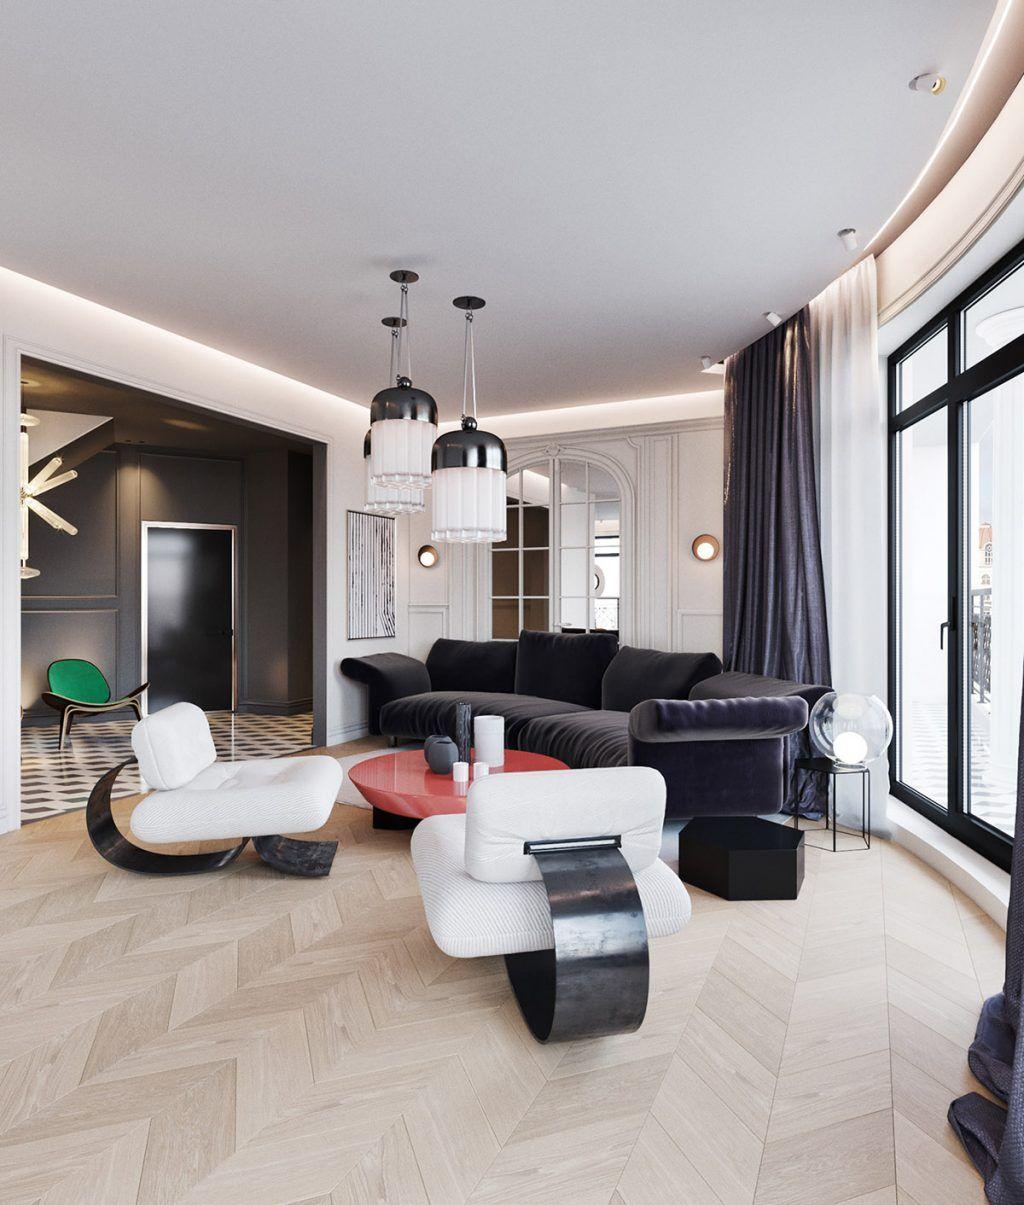 One Space Two Design Options Interior Design Decor Interior